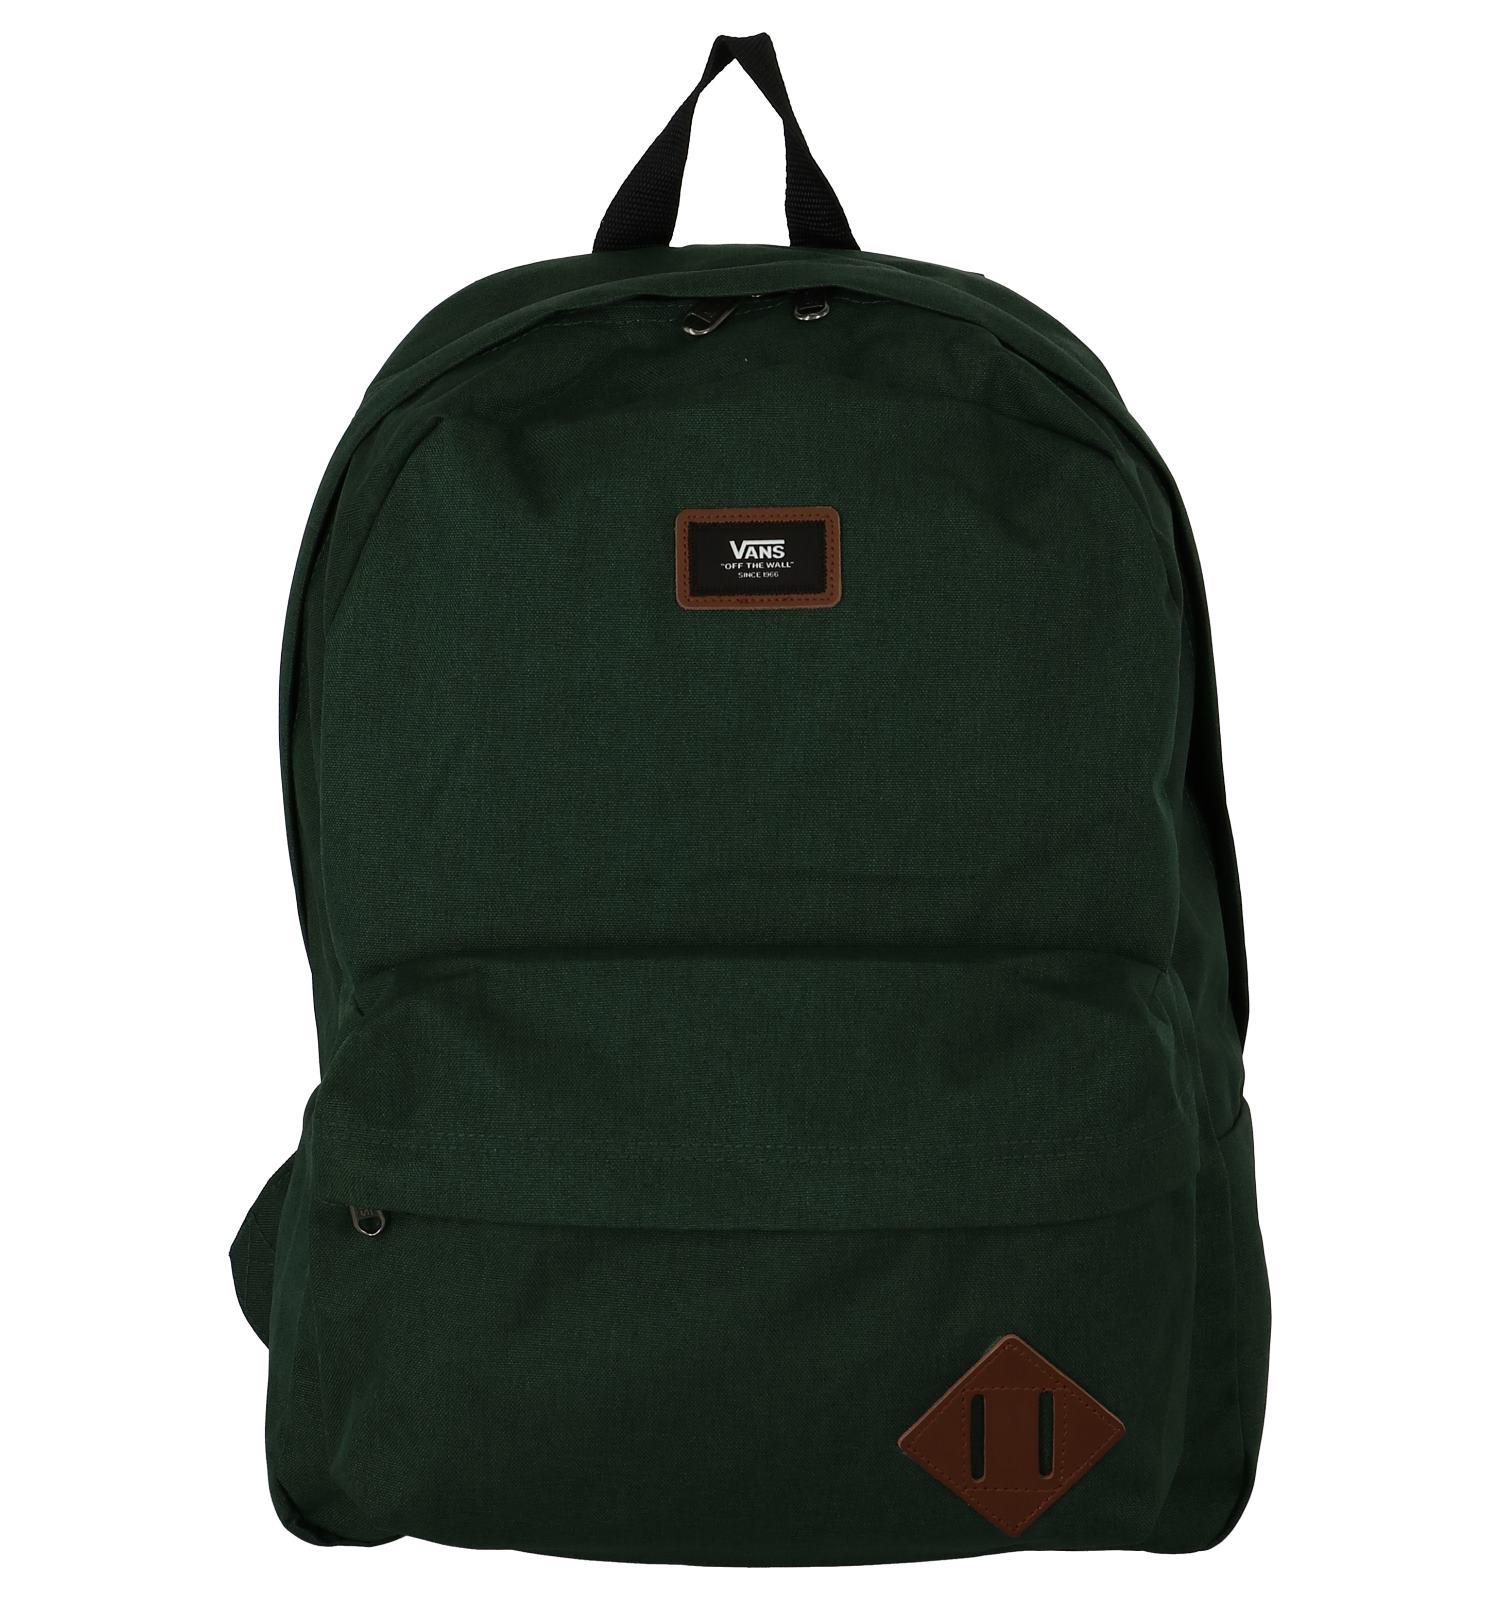 df16559fed5c8b Donkergroene Rugzak Vans Old Skool II Backpack